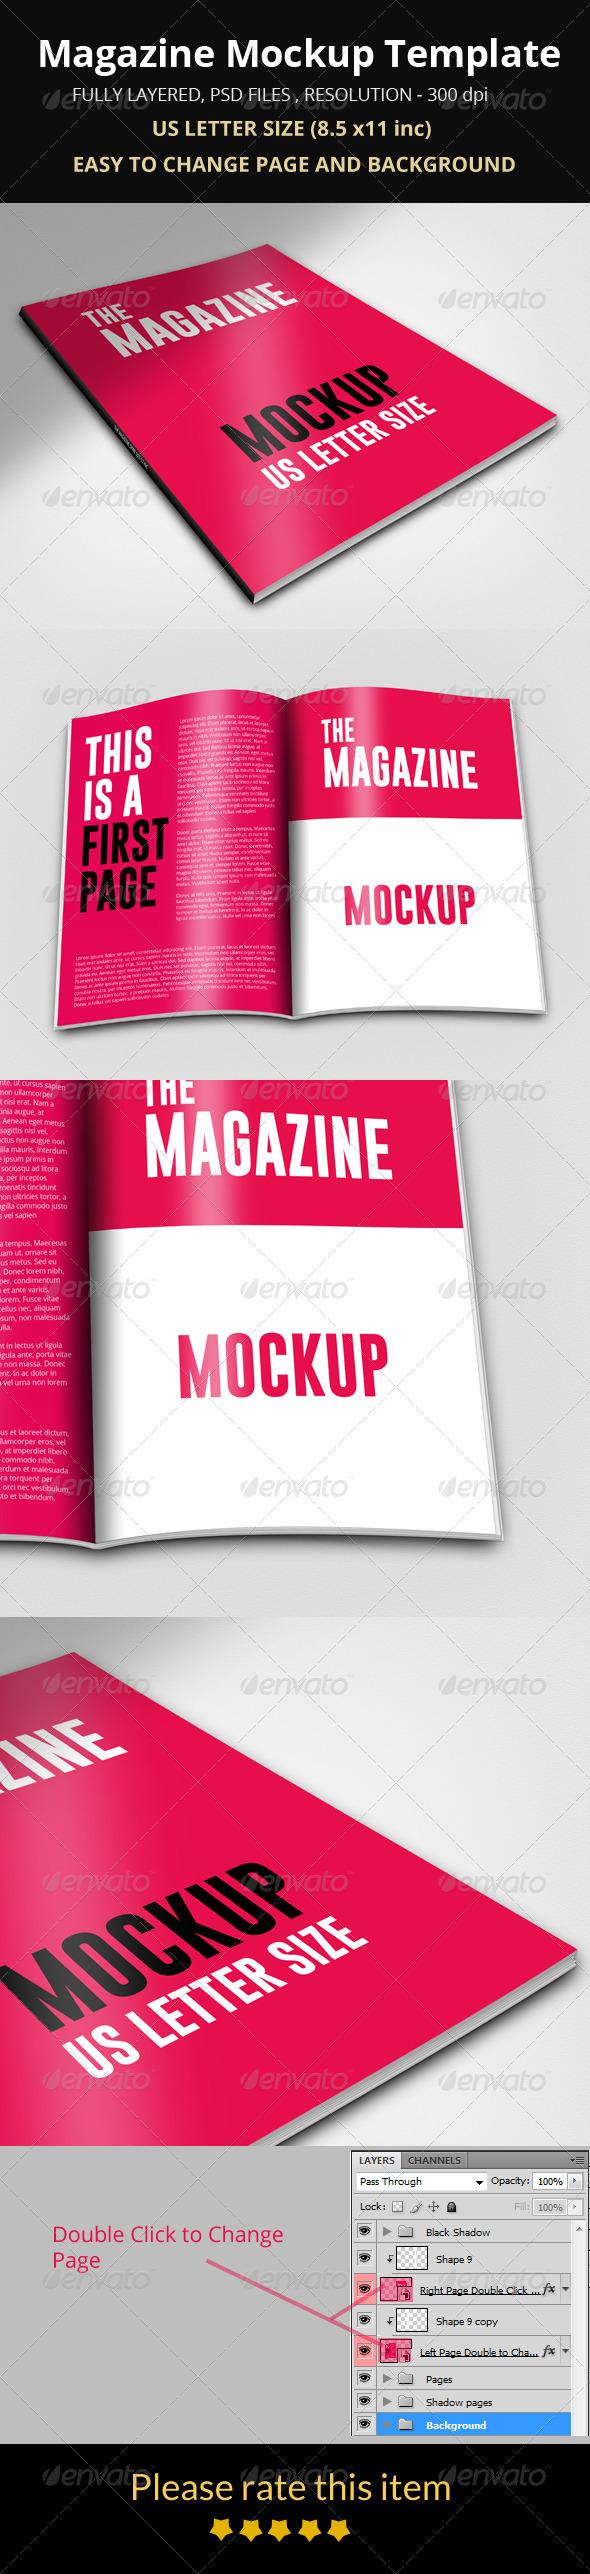 GraphicRiver Magazine Mockup Template 8608381